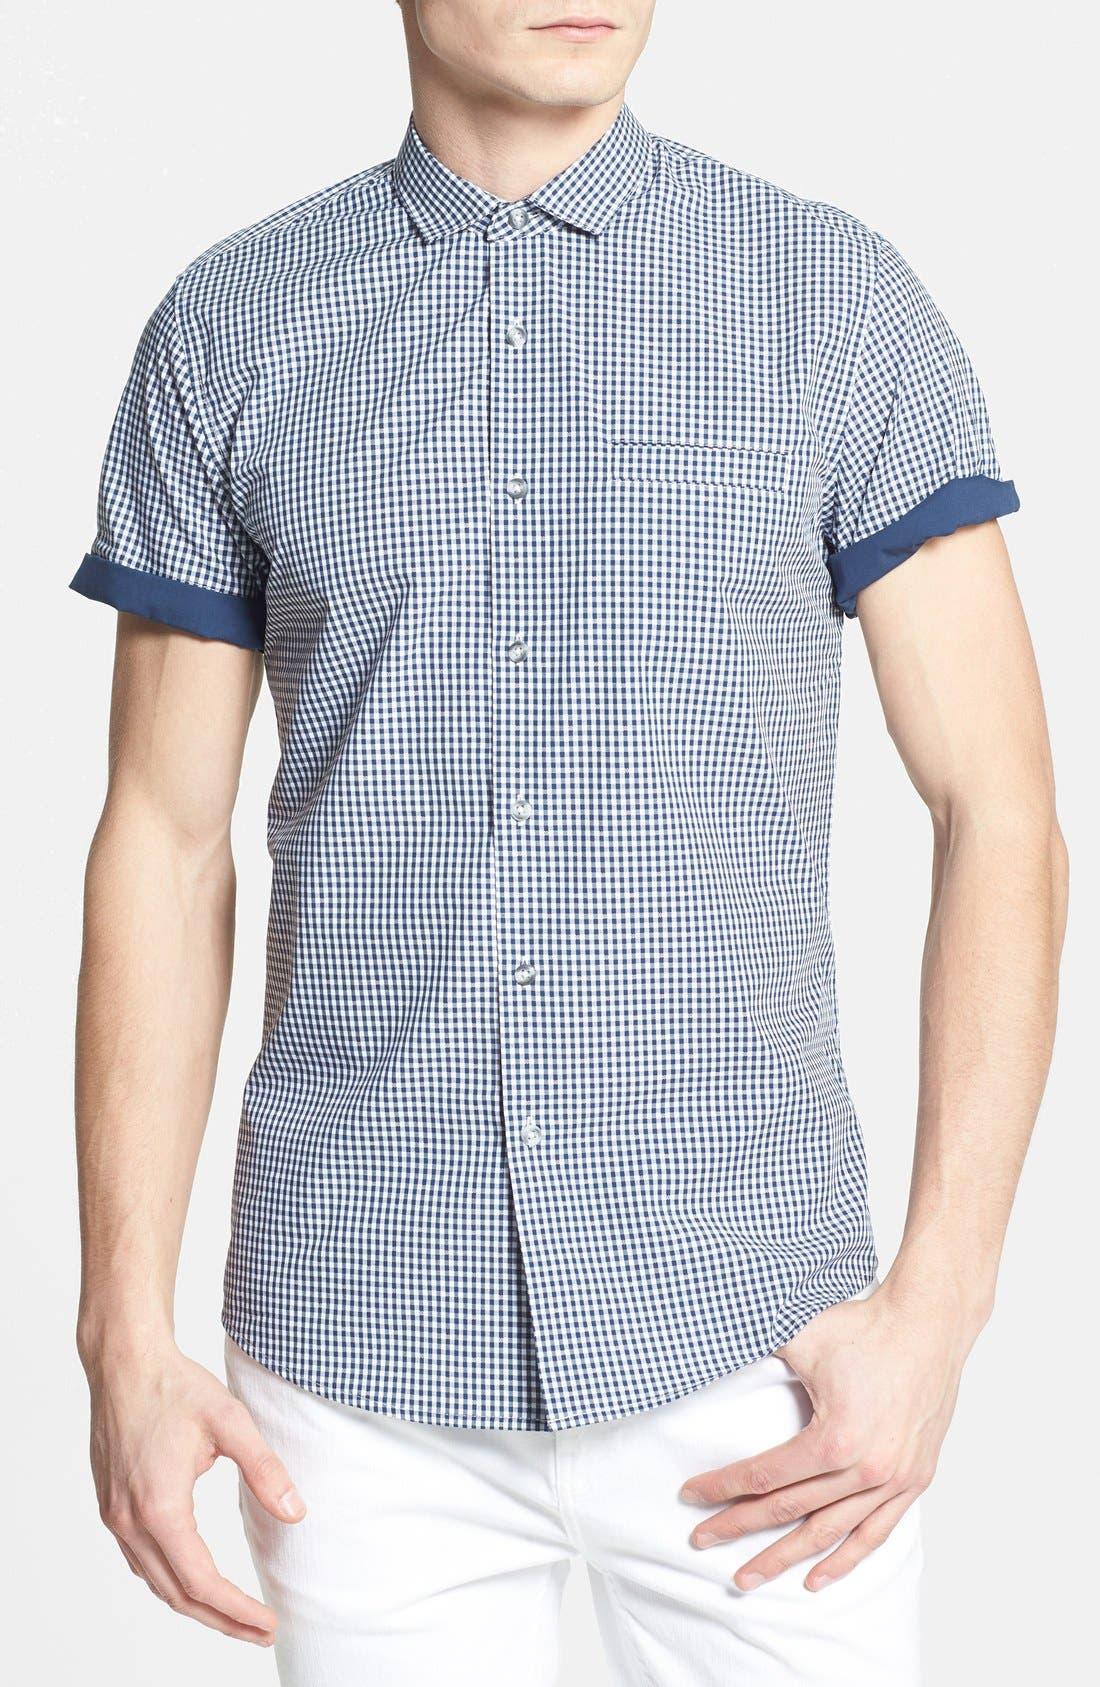 Main Image - Topman Slim Fit Short Sleeve Gingham Shirt